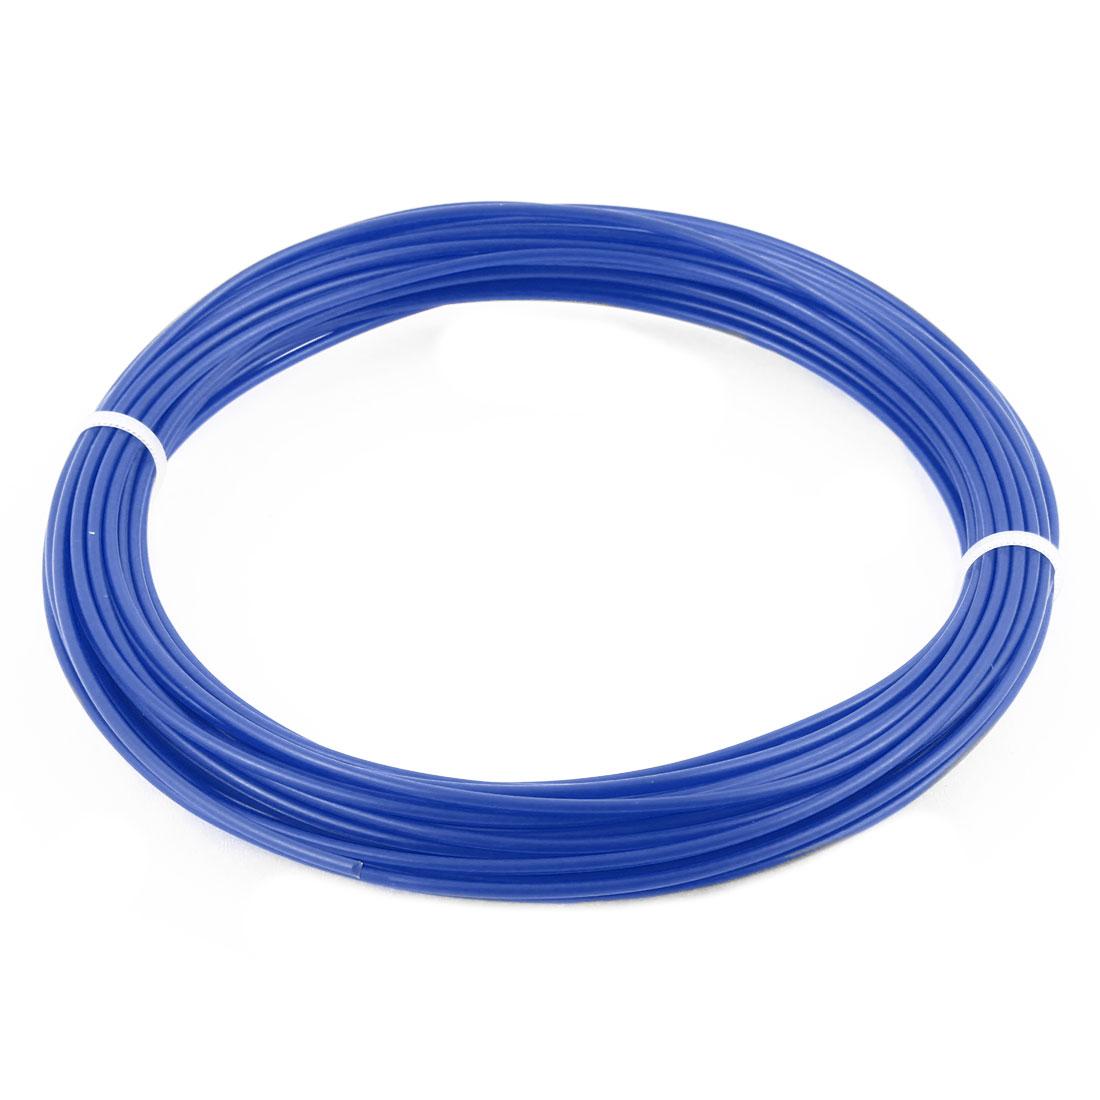 10m 3D Printer Pen Painting Filament Refills PLA Printing Material Blue